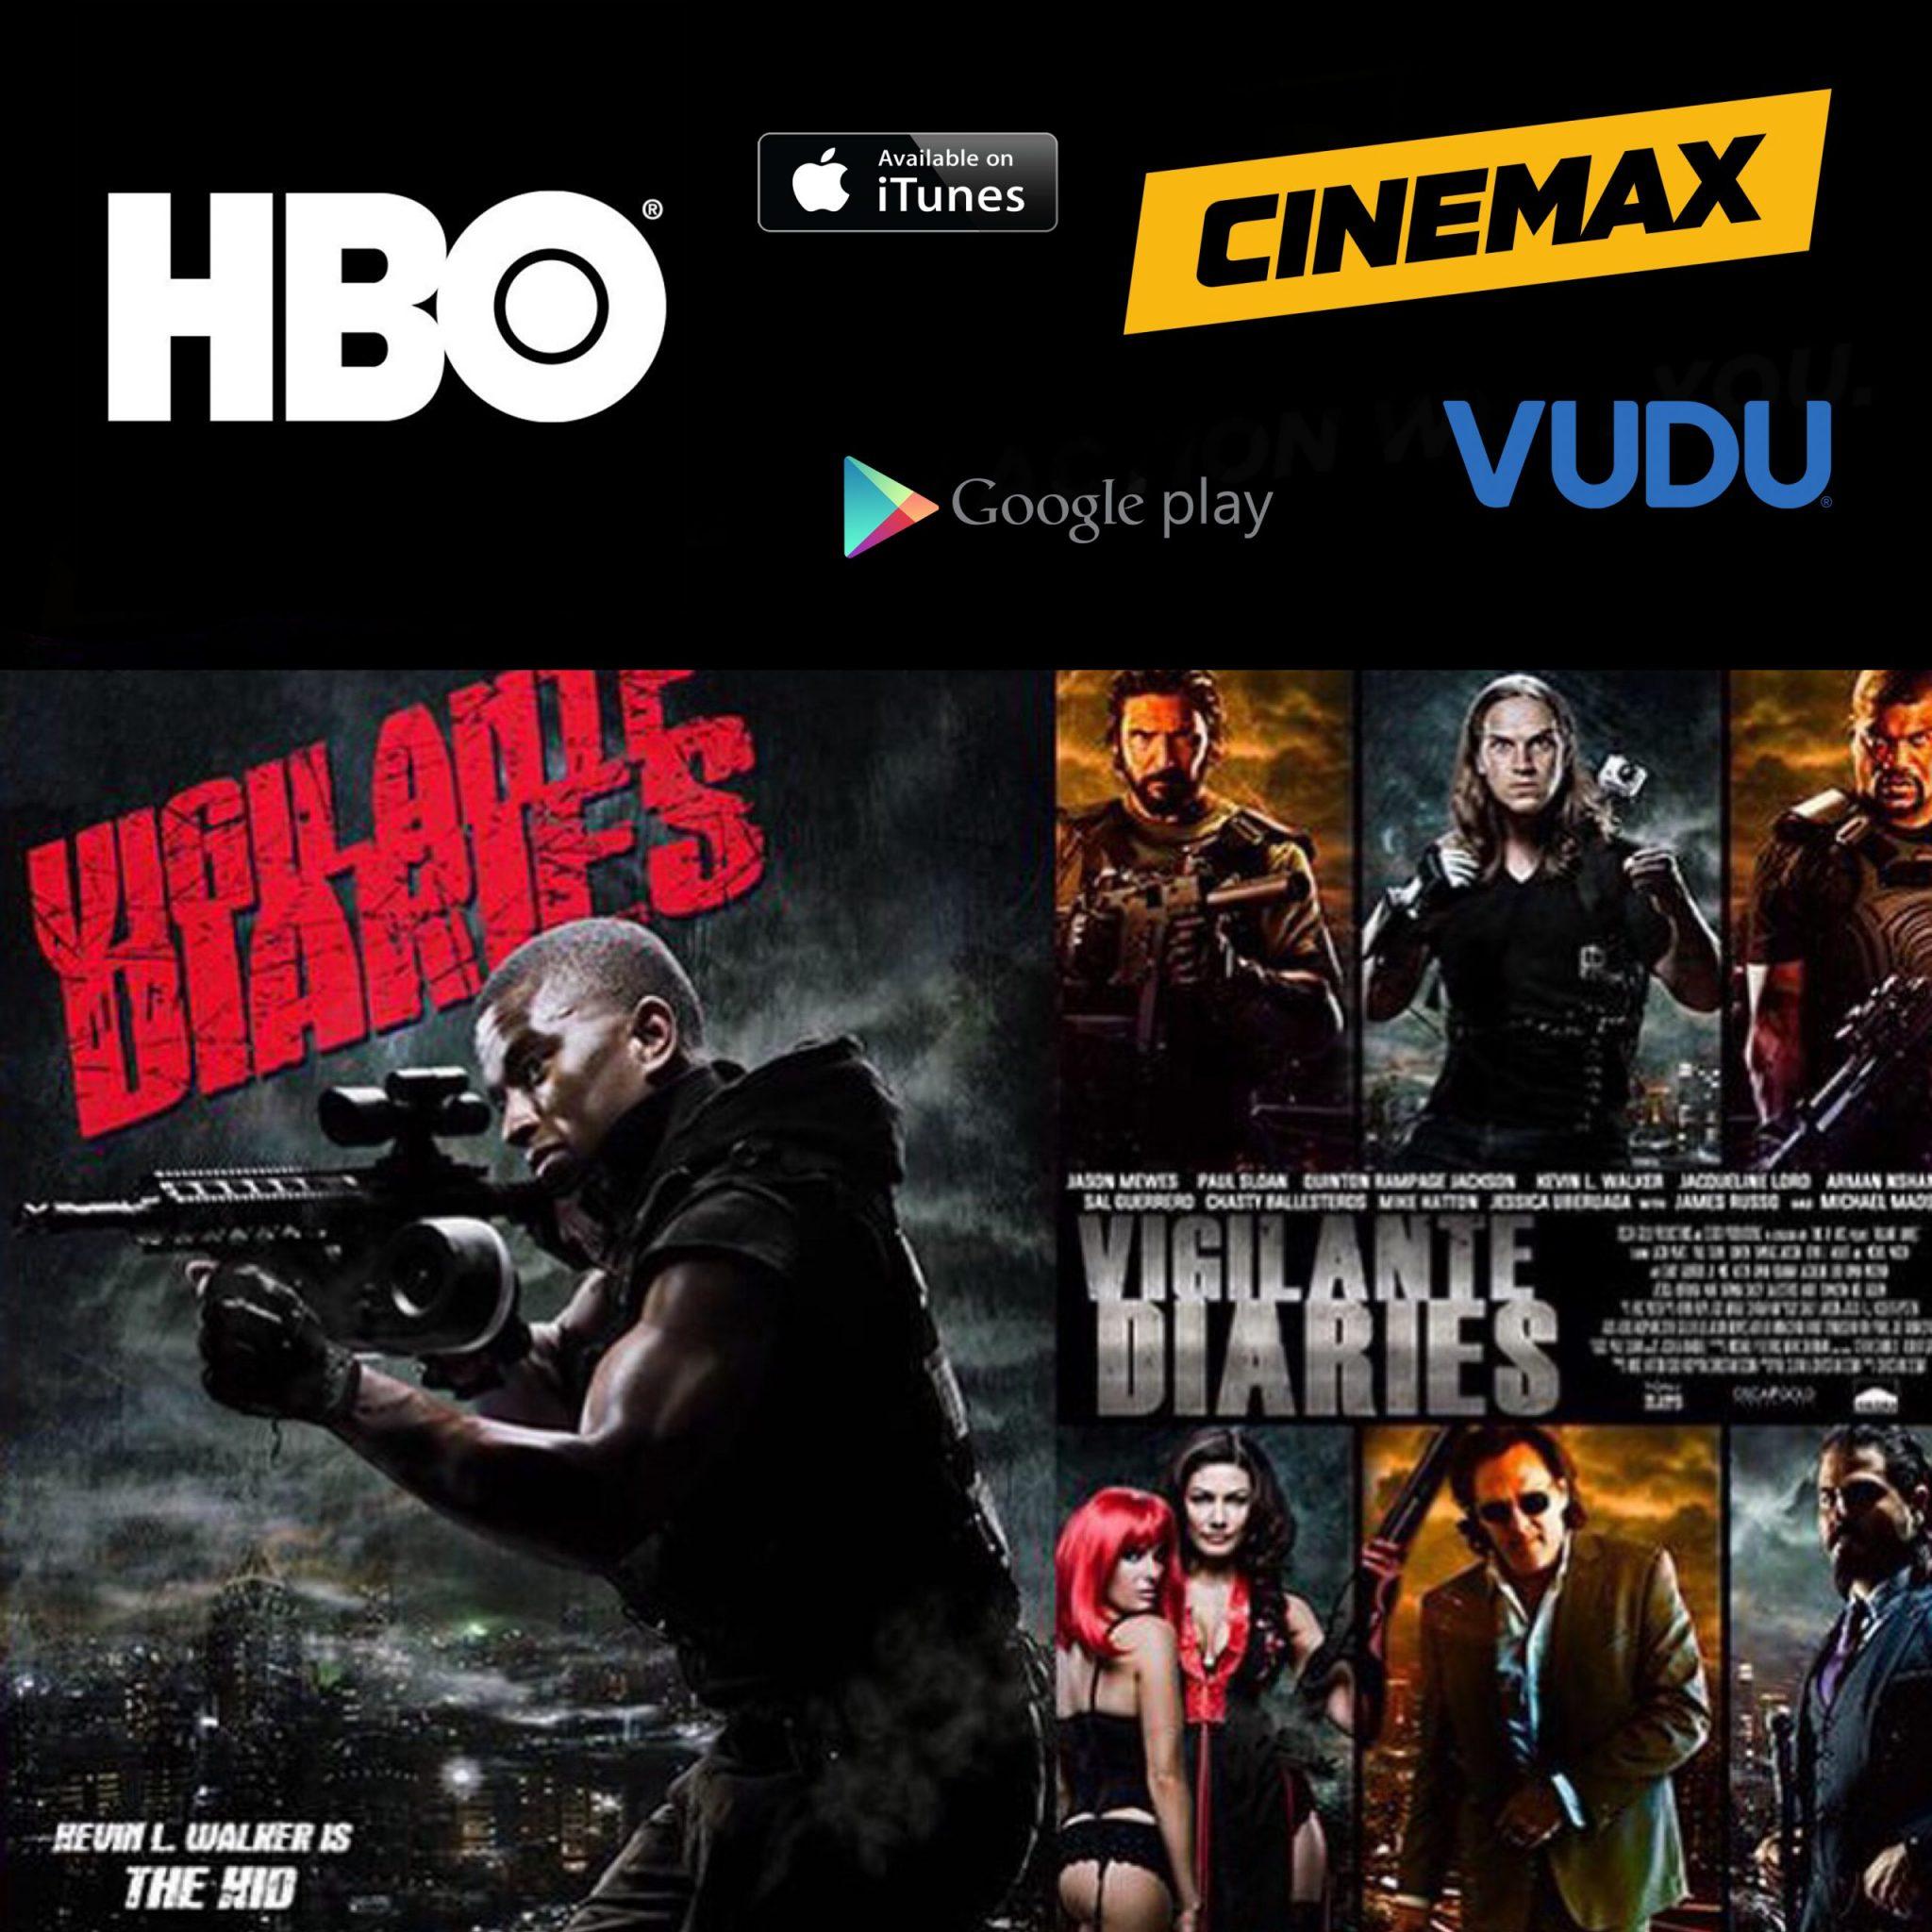 Vigilante Diaries Producers: Oscar Akopyan, Mike Hatton-Ton of Hats FIlms, Christian Sesma, Nick Vallenlonga, --- OWE $250,000 via FEDERAL JUDGEMENT